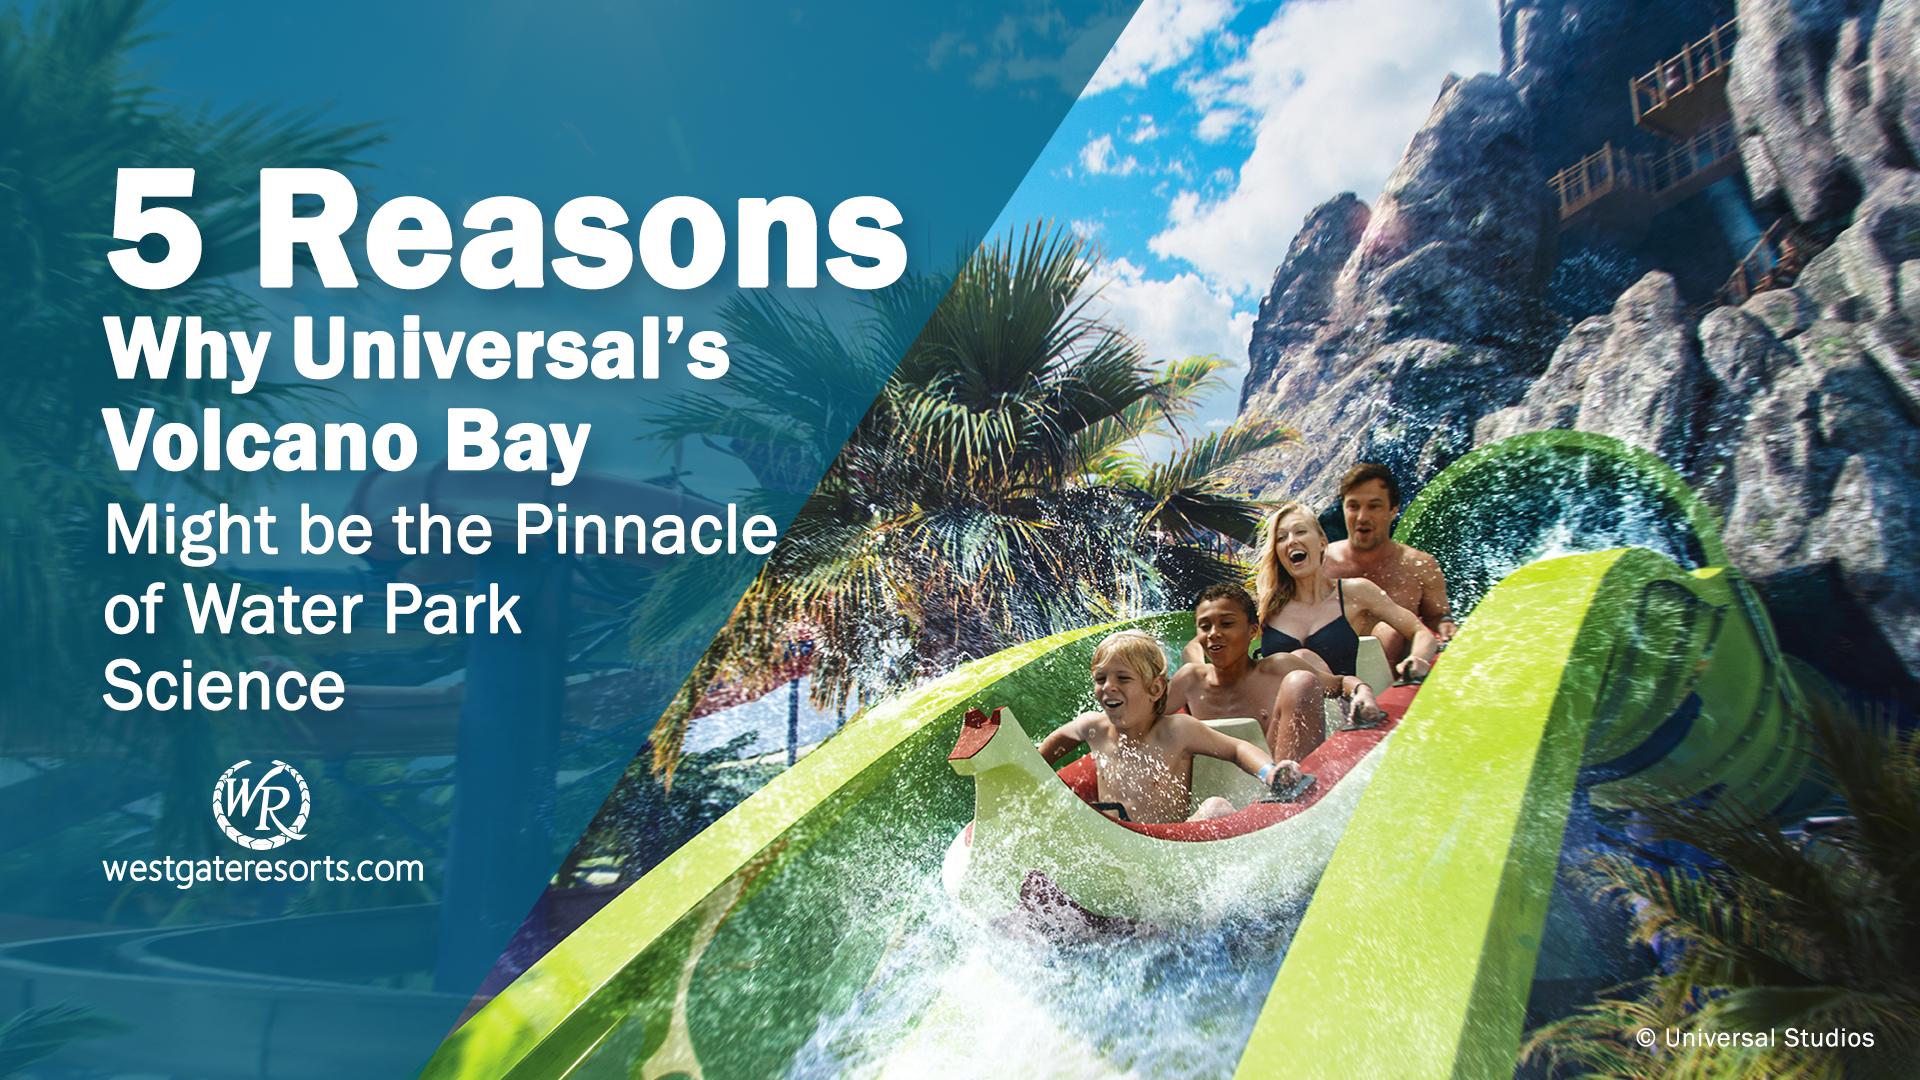 Universal Studios Florida Volcano Bay Water Park | Water Park Science | Westgate Resorts